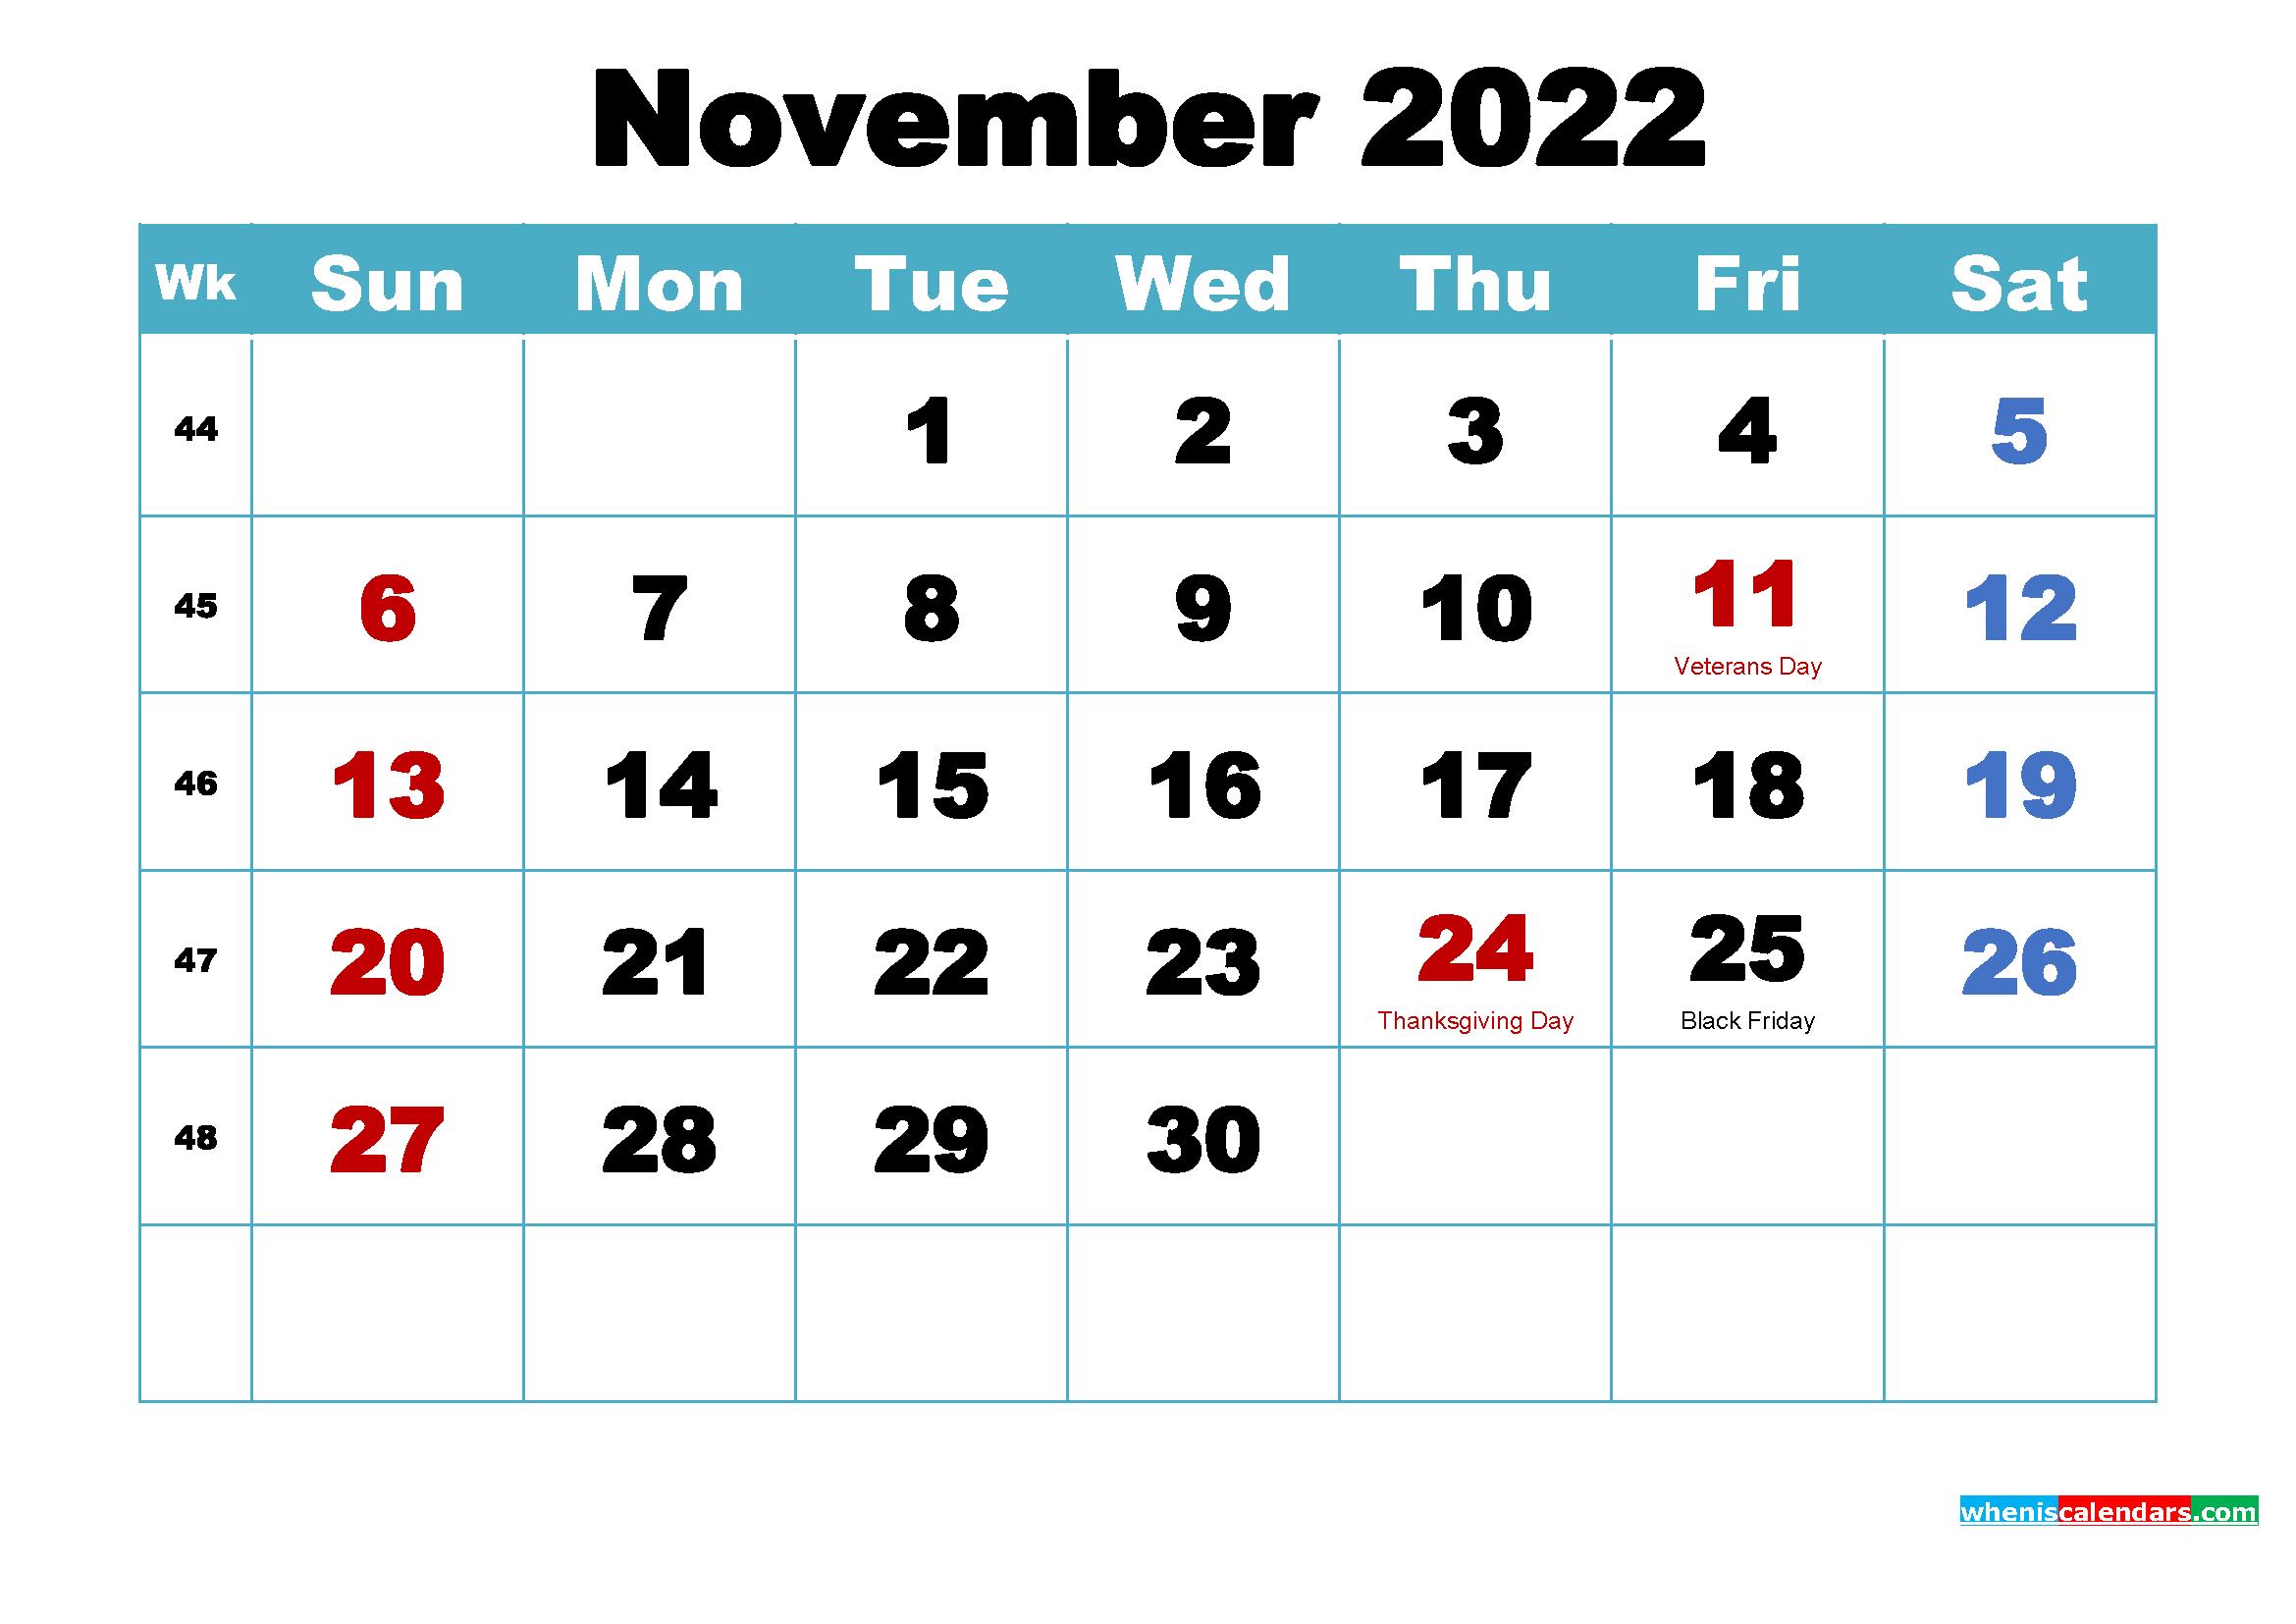 Printable November 2022 Calendar.November 2022 Calendar Wallpaper Free Download Free Printable 2021 Monthly Calendar With Holidays